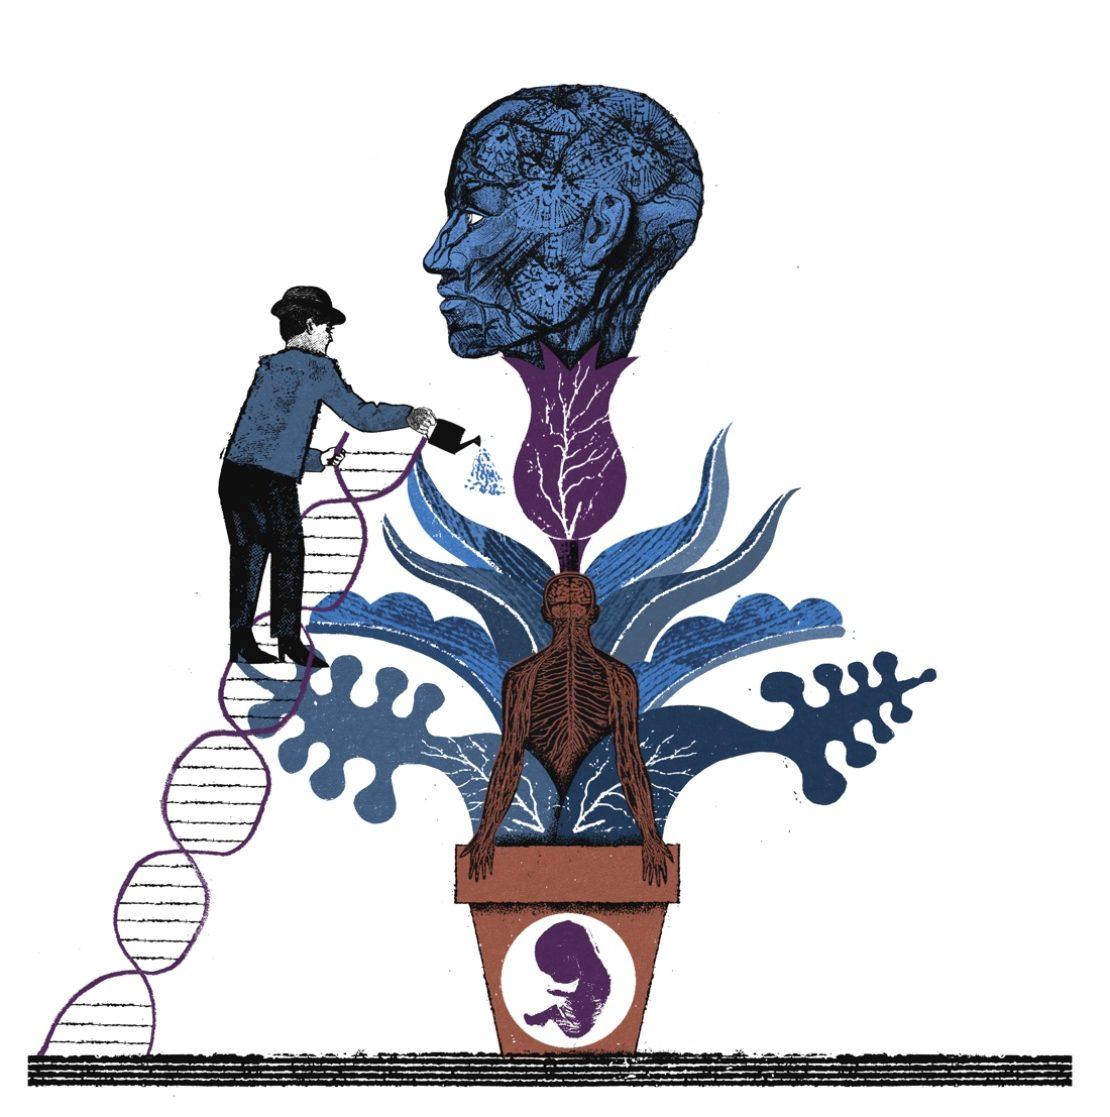 Genomics and me